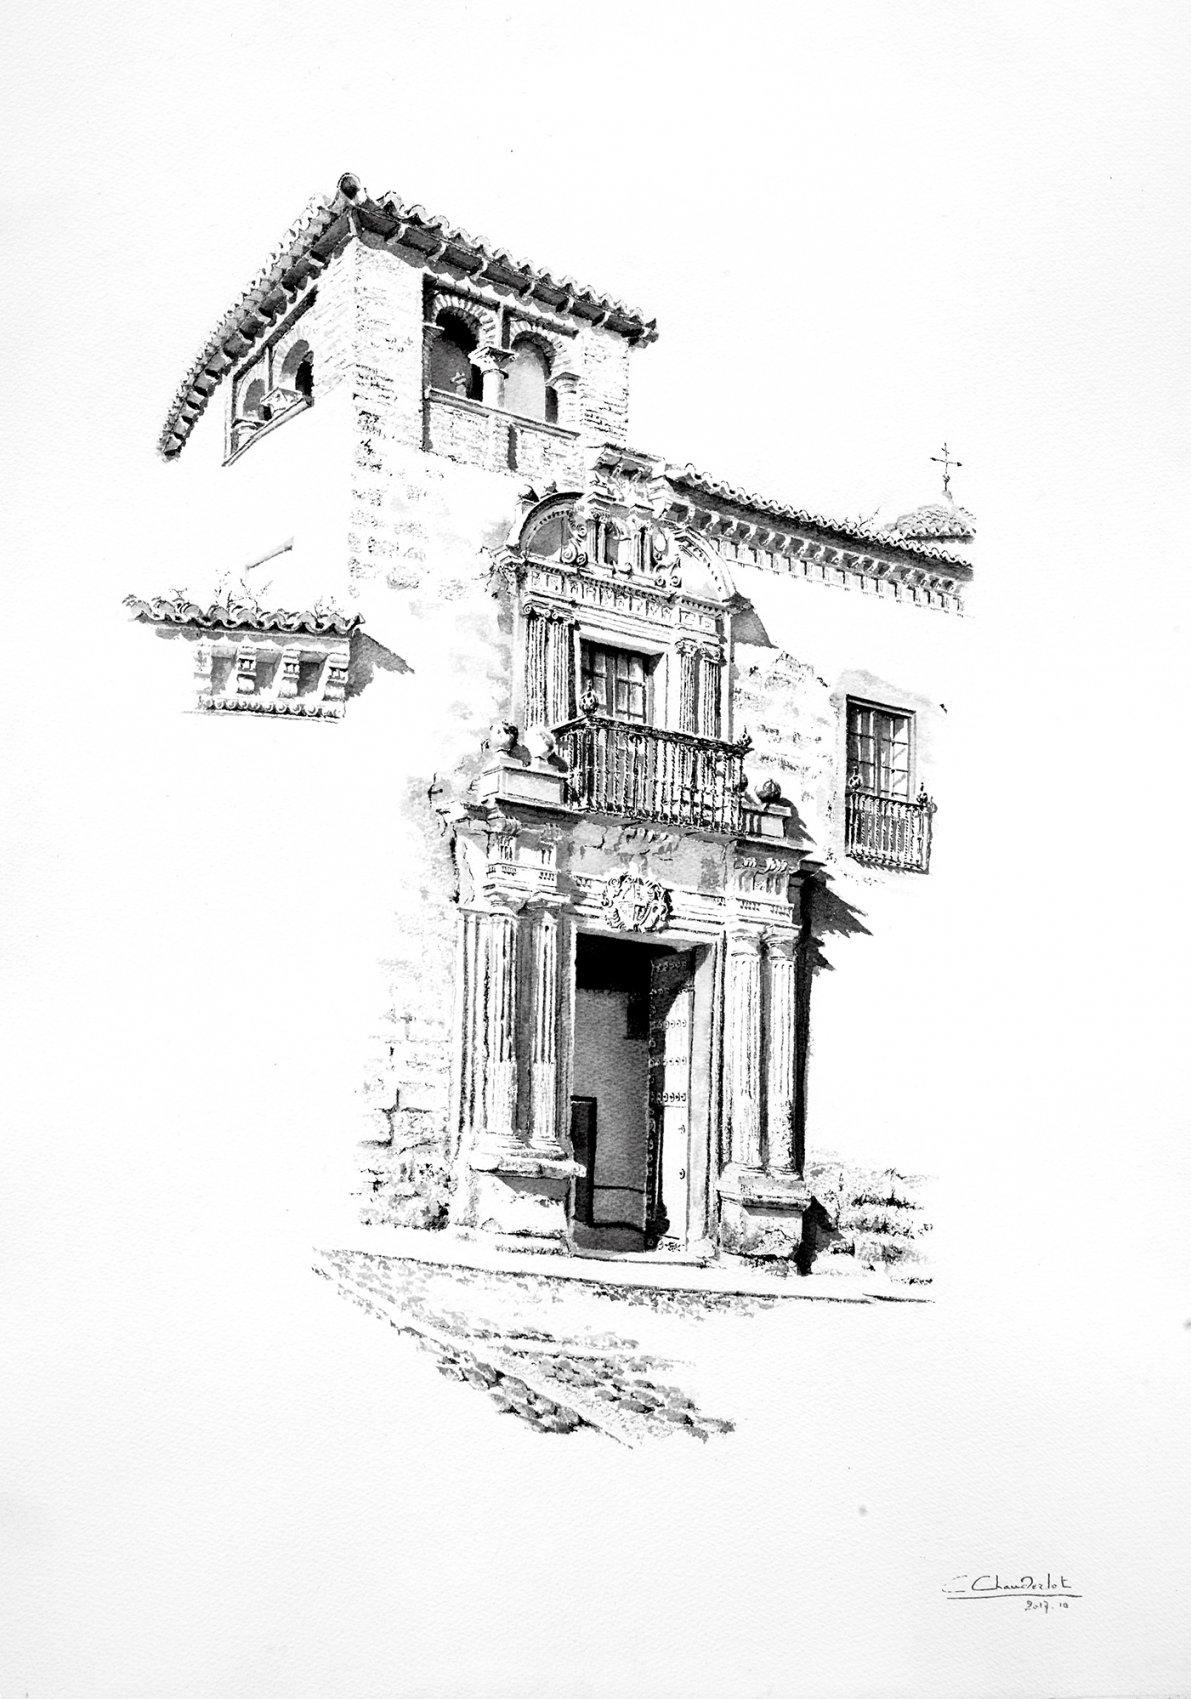 Palacio Mondaron (2017) - Carlos Chauderlot Cortes - Charles CHAUDERLOT